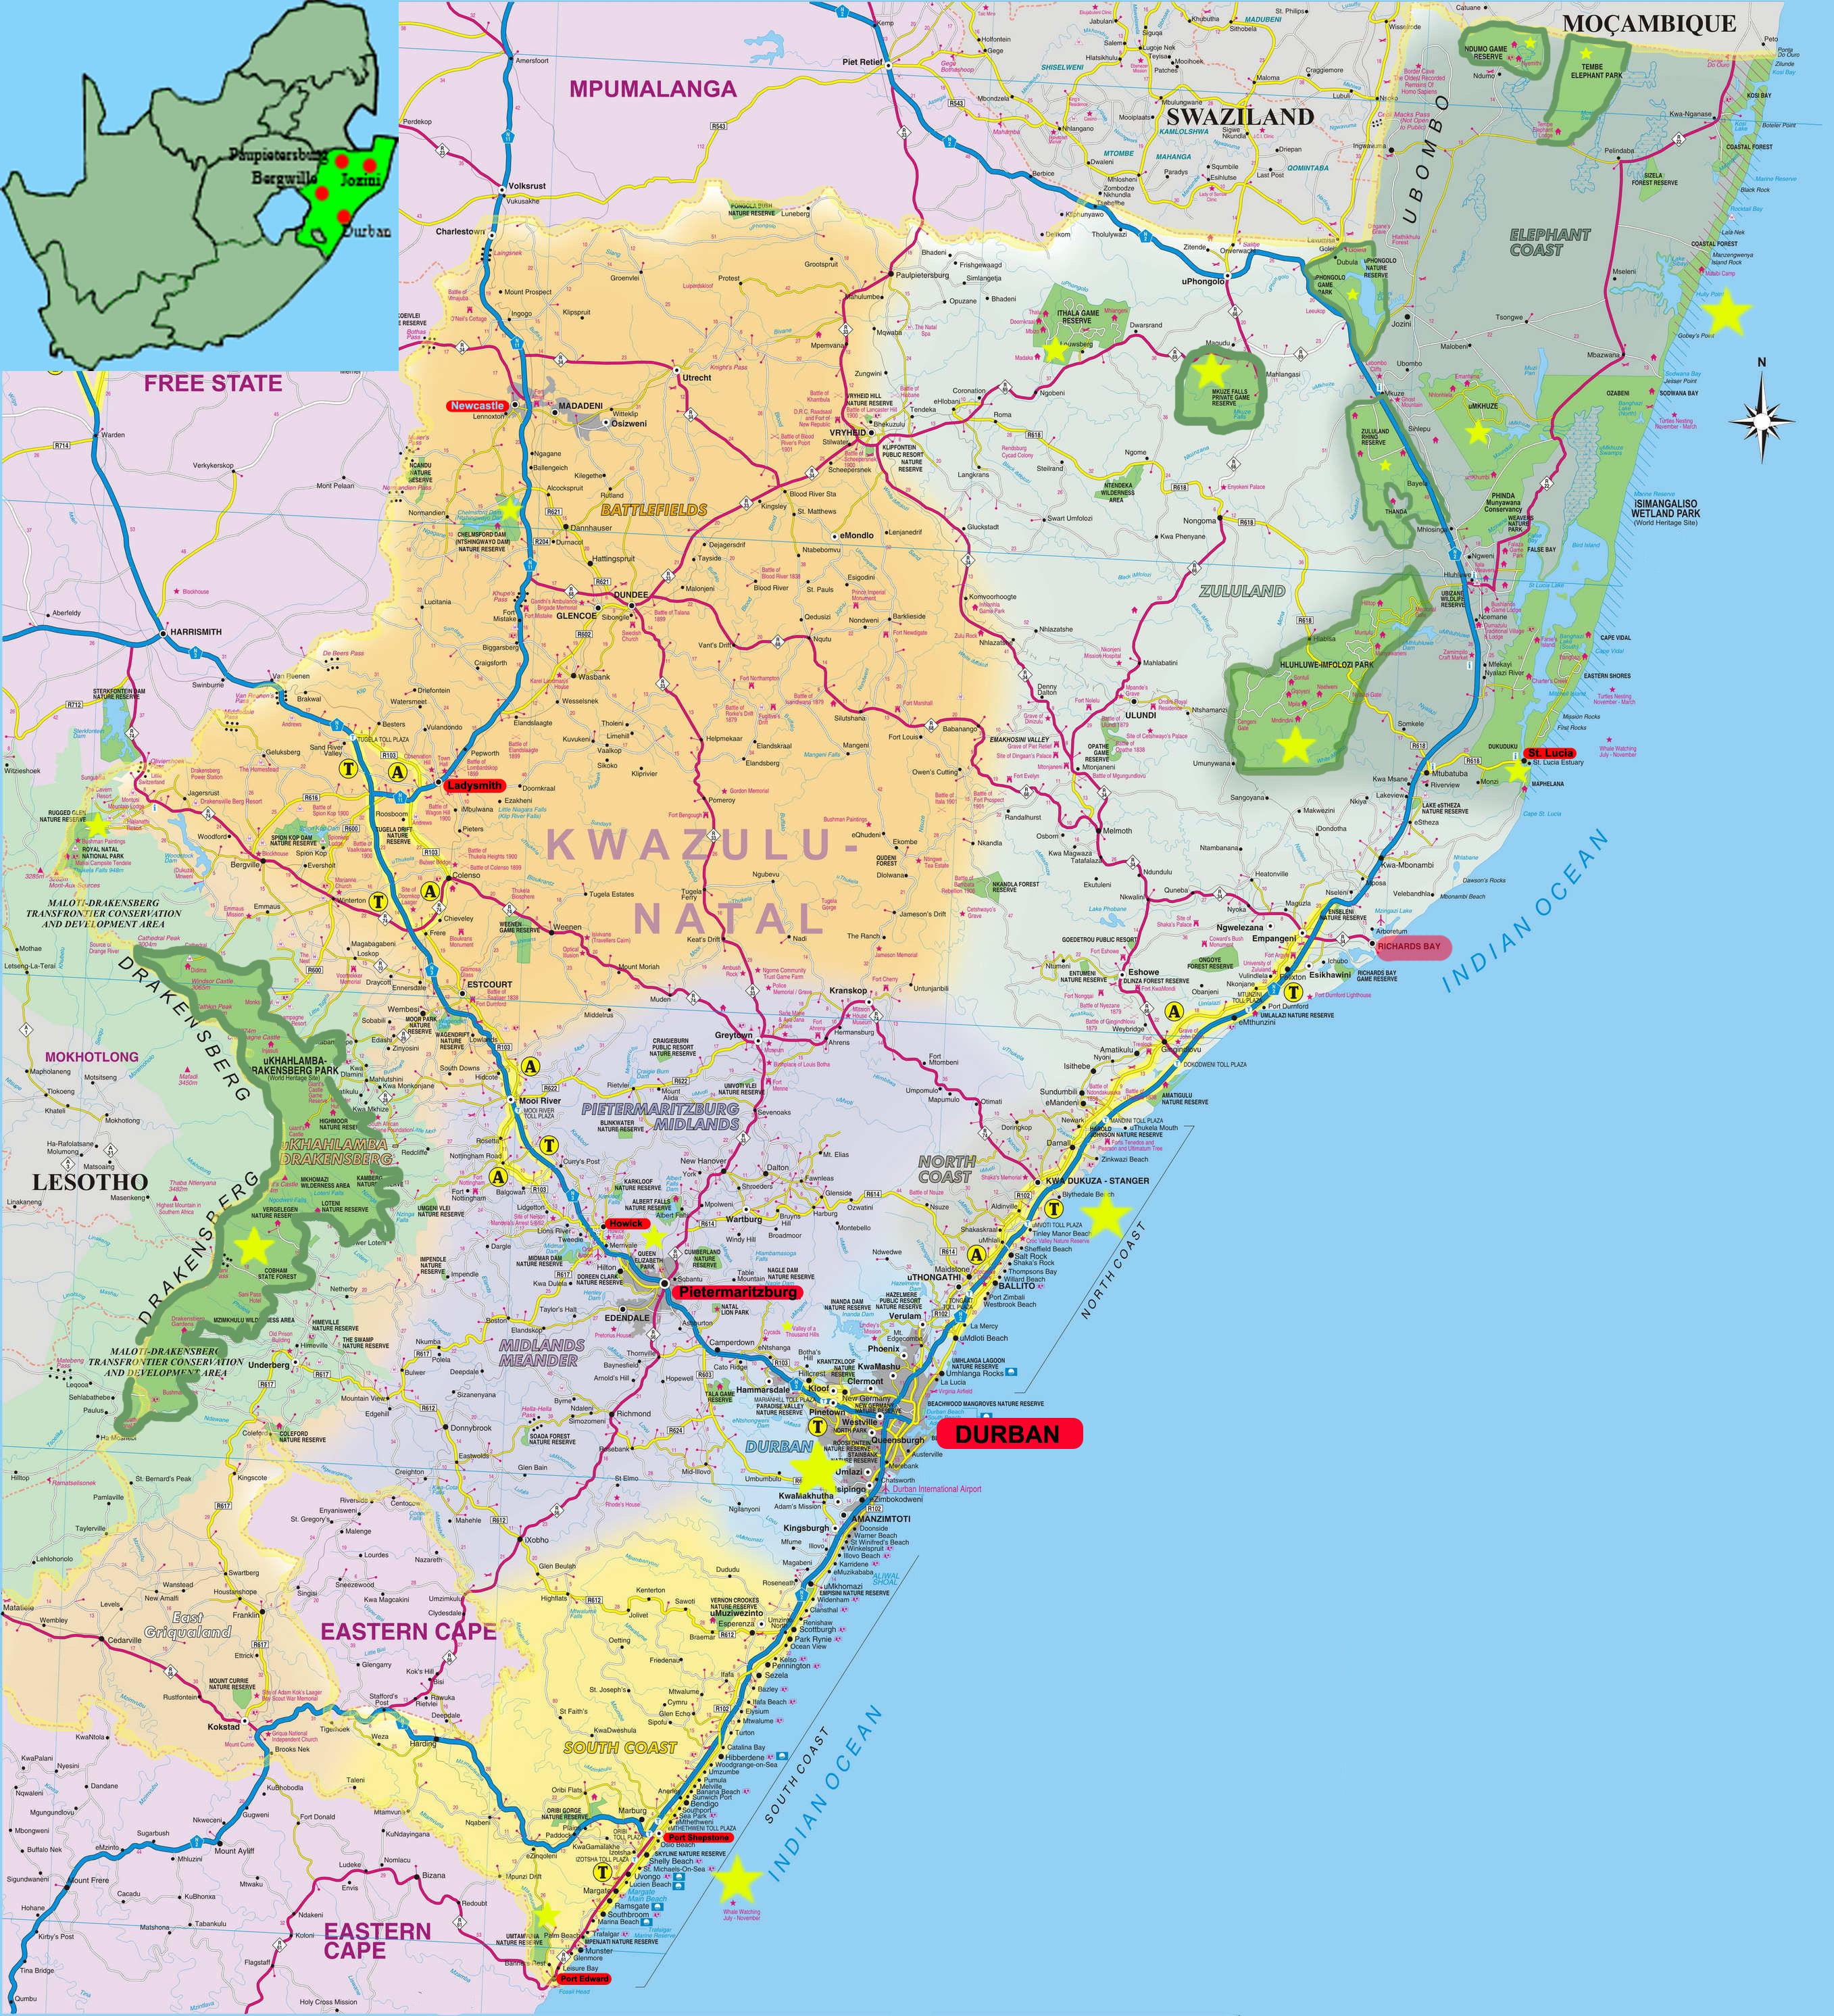 Durban travel guide accommodation tourist information kwazulu natal map sciox Gallery